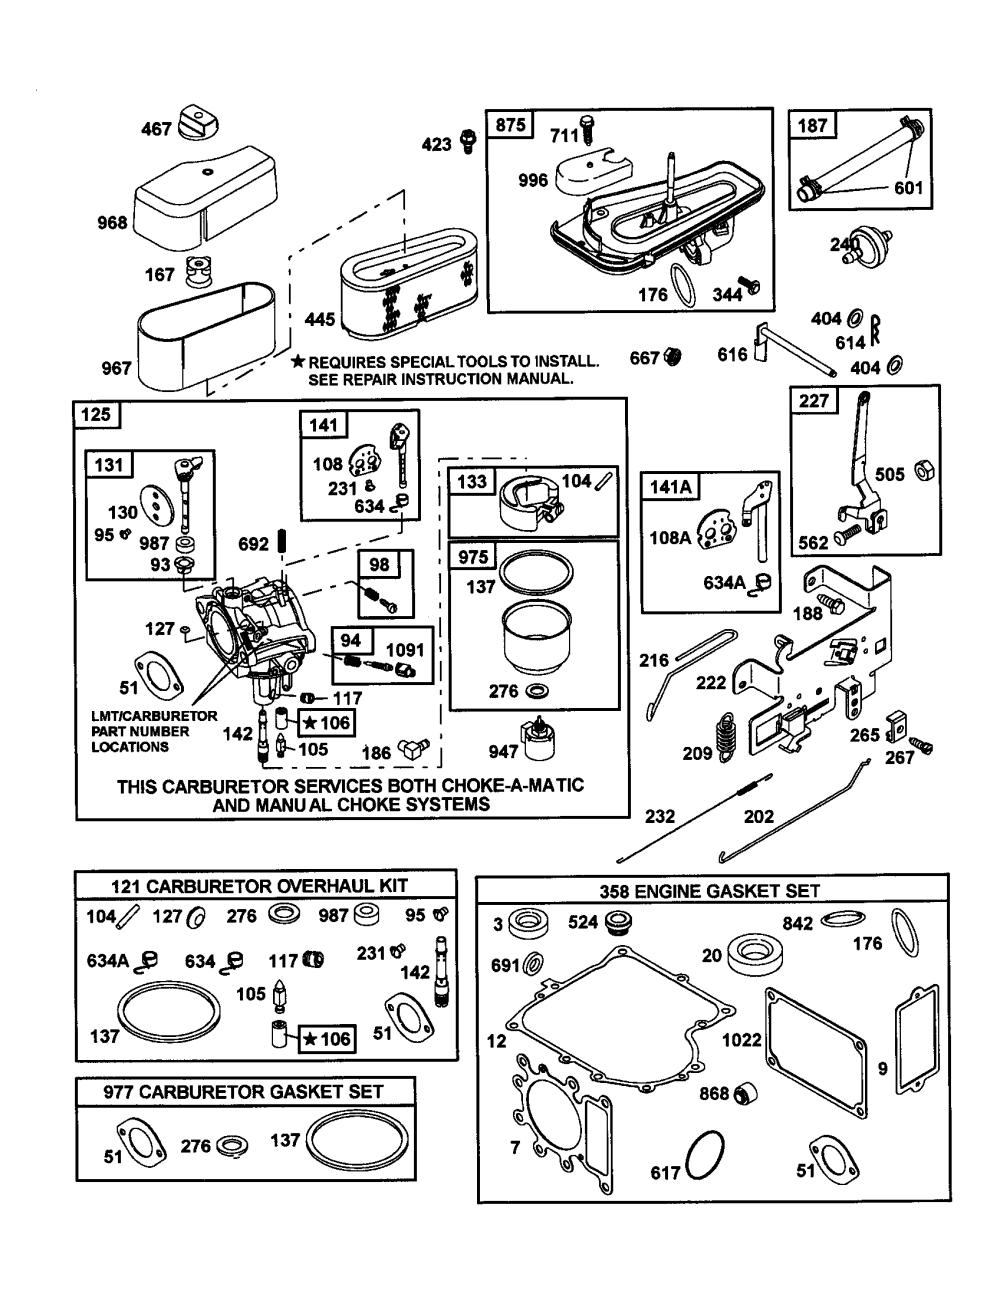 medium resolution of briggs stratton 310707 0136 e1 carburetor diagram